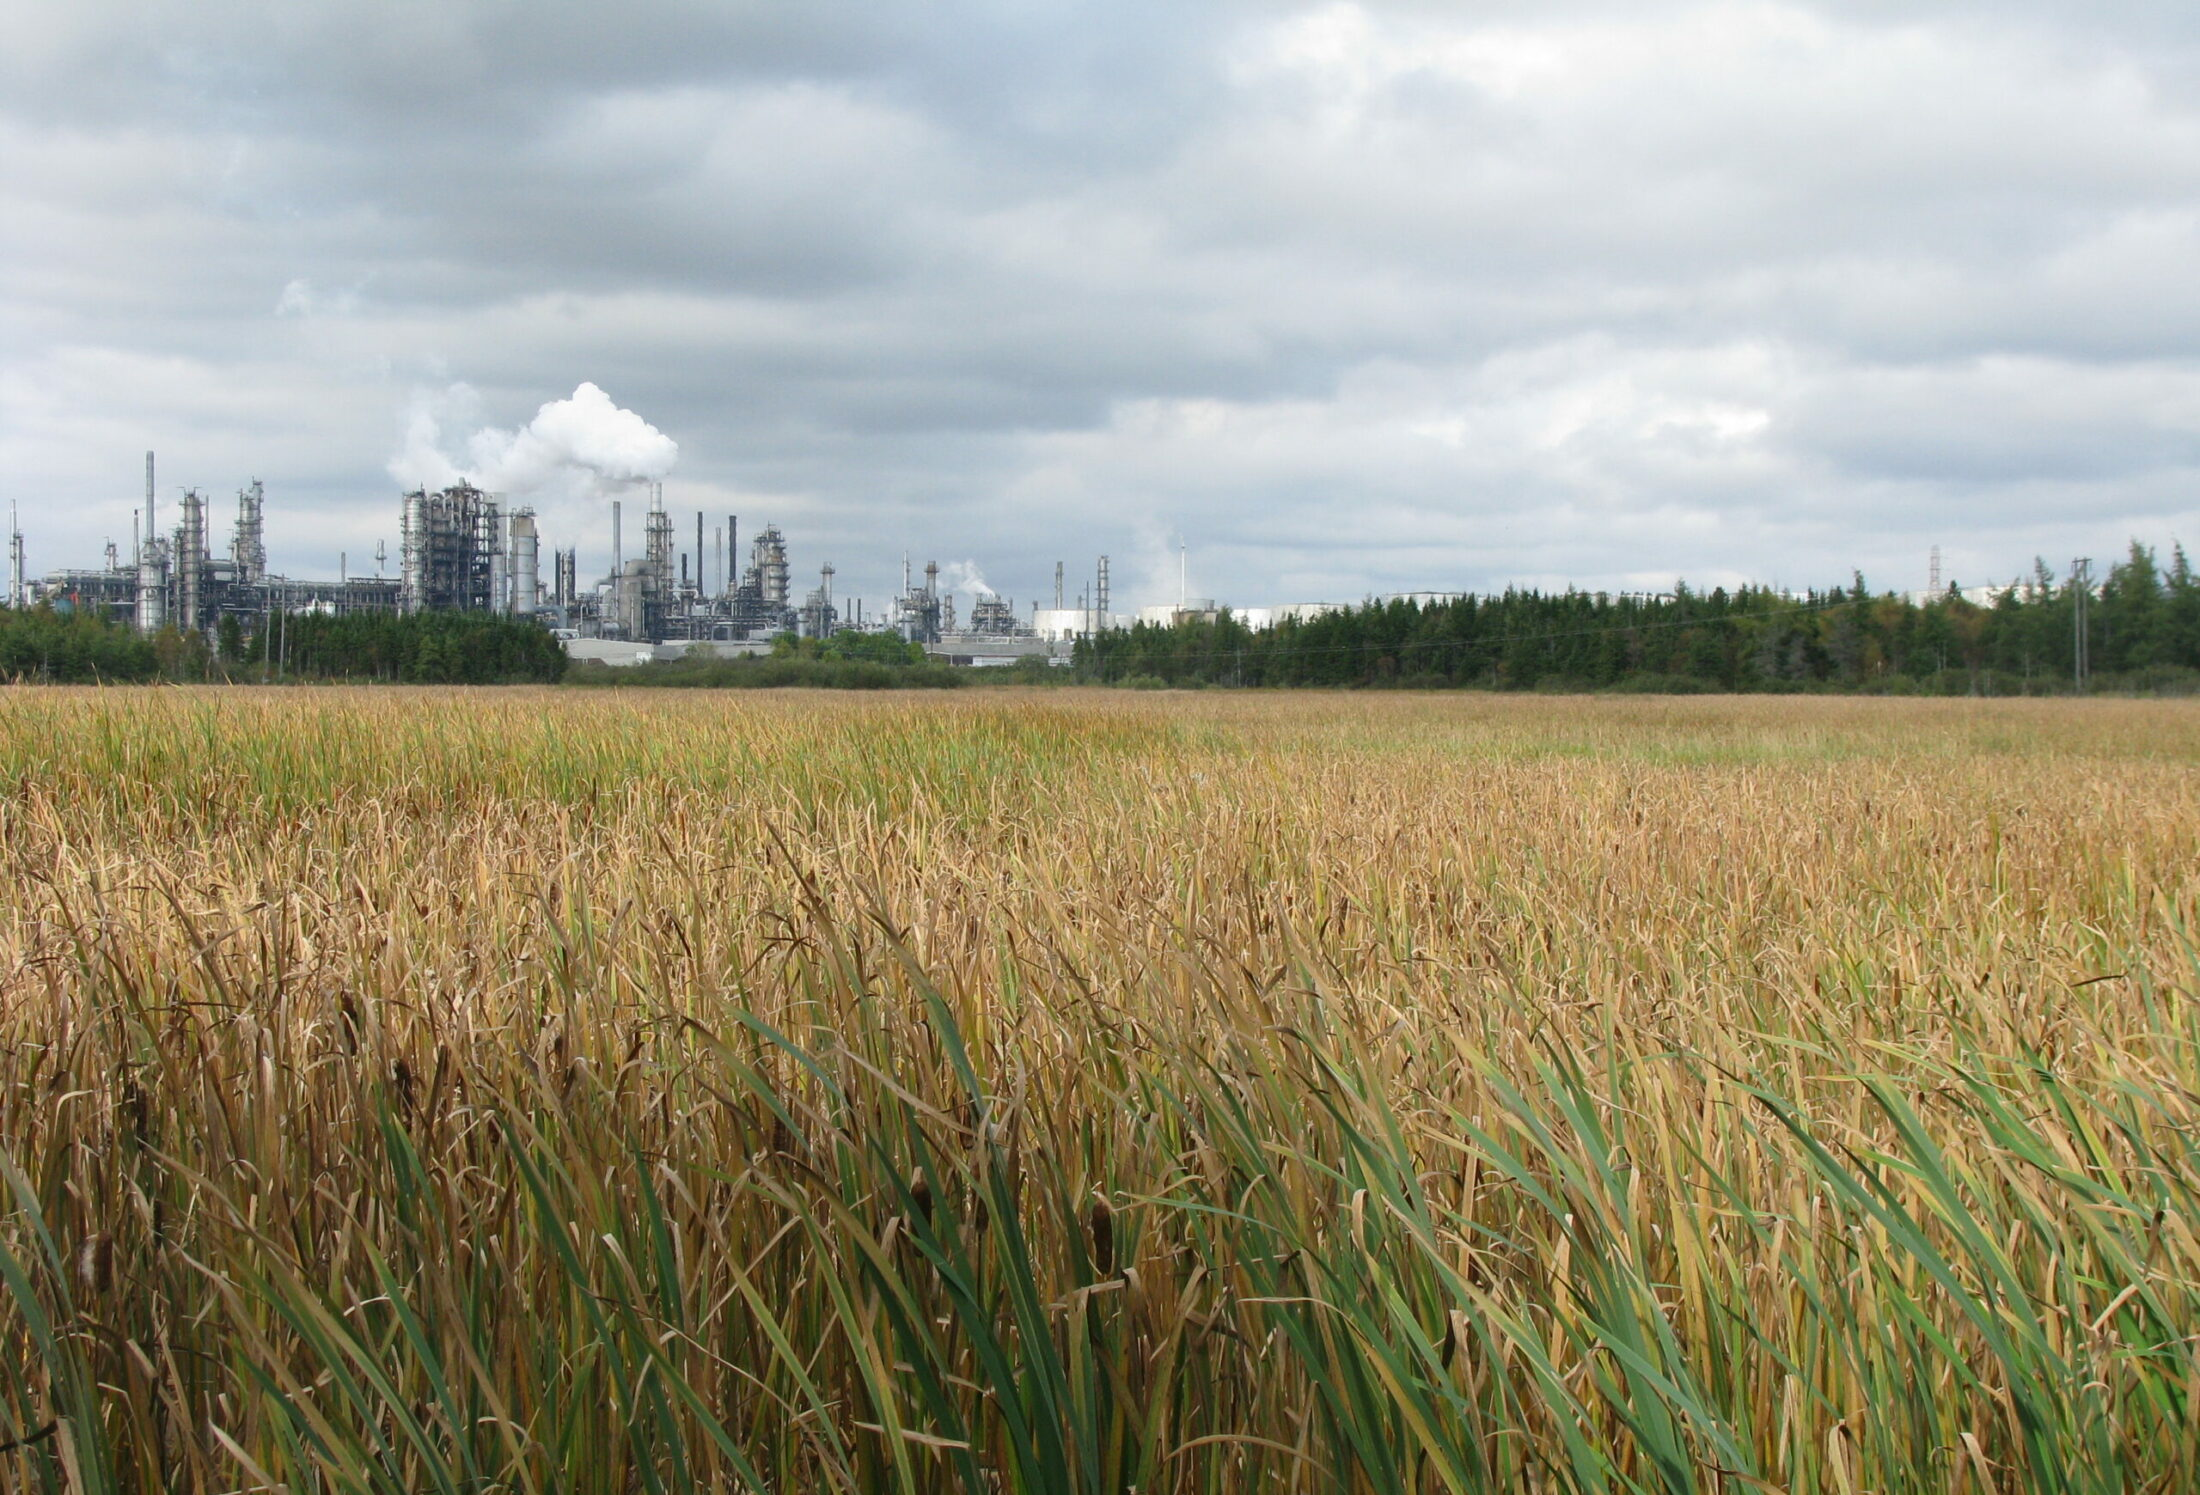 Irving Oil Refinery